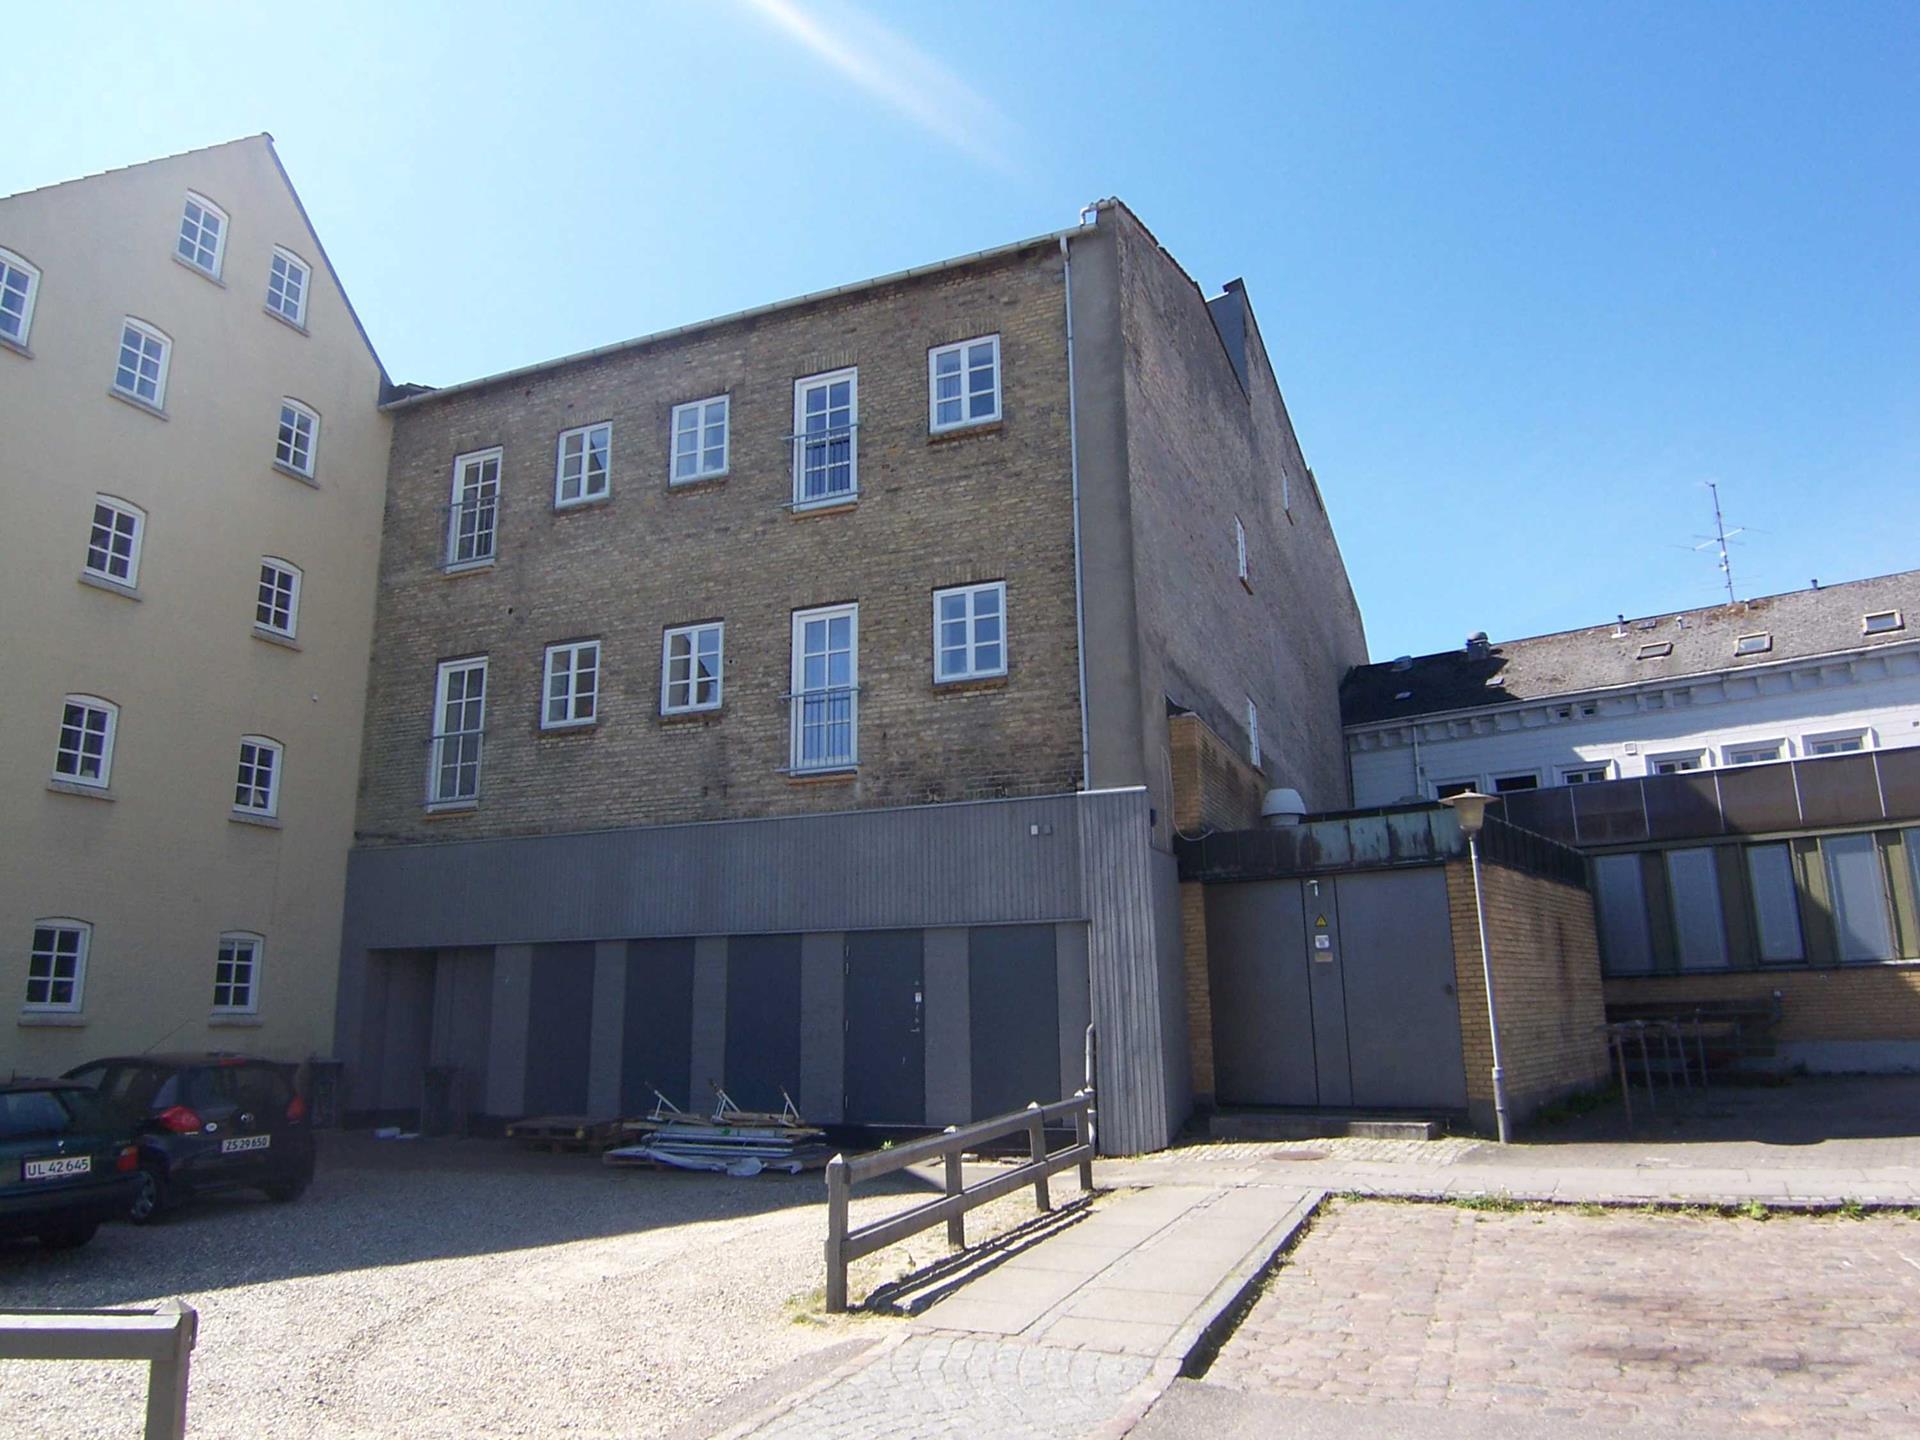 Bolig/erhverv på Perlegade i Sønderborg - Bag facade